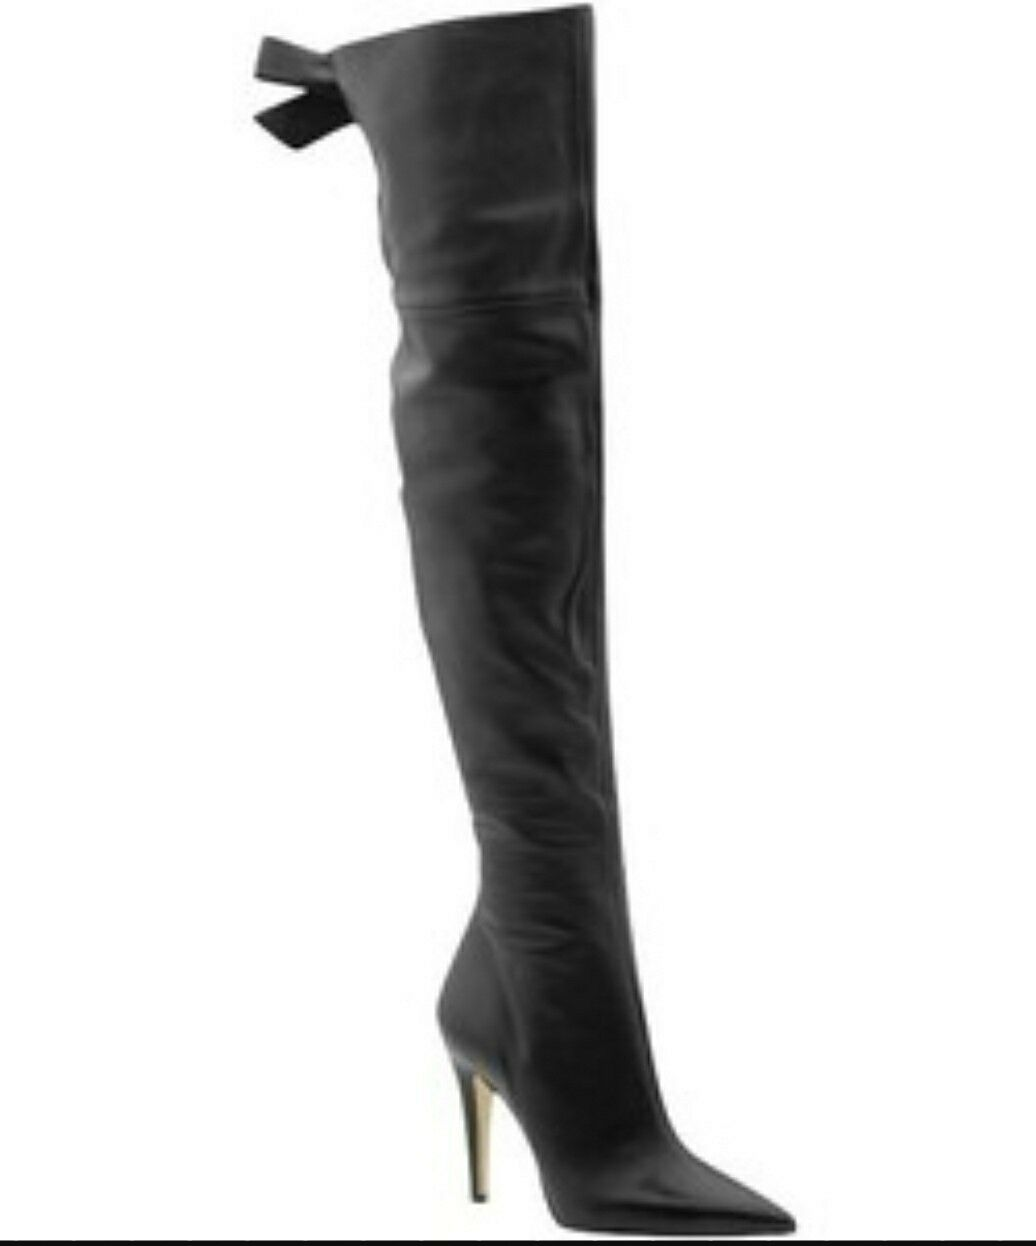 Via Spiga Black Leather OTK Over The Knee Thigh High Boots Bow Slim Calf 8